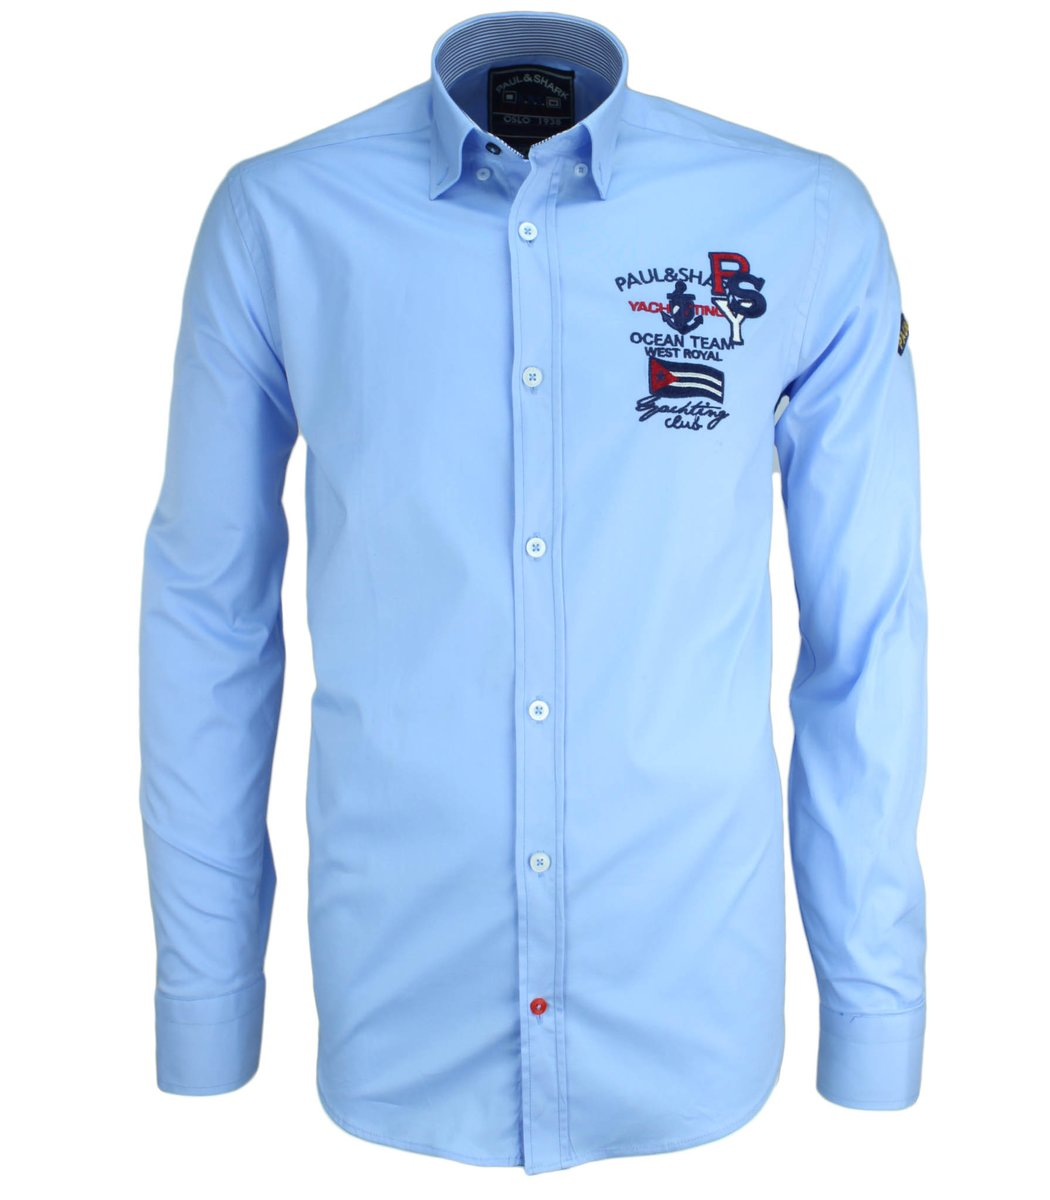 Голубая рубашка Paul&Shark RP3 (2895)